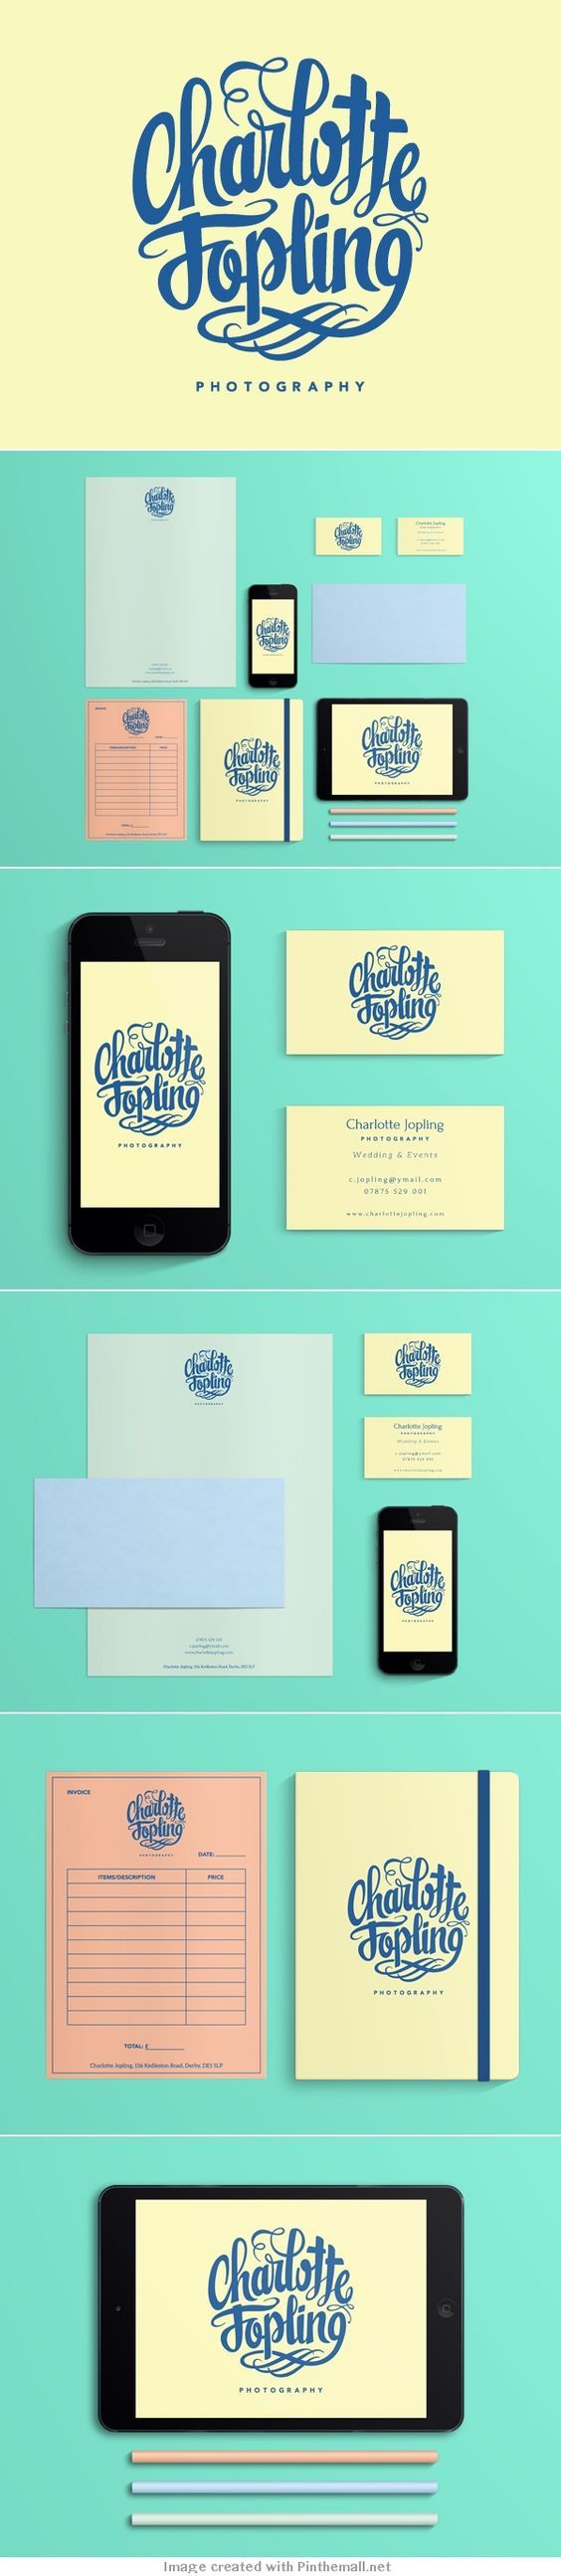 Charlotte Topling Photography Branding   Fivestar Branding – Design and Branding Agency & Inspiration Gallery